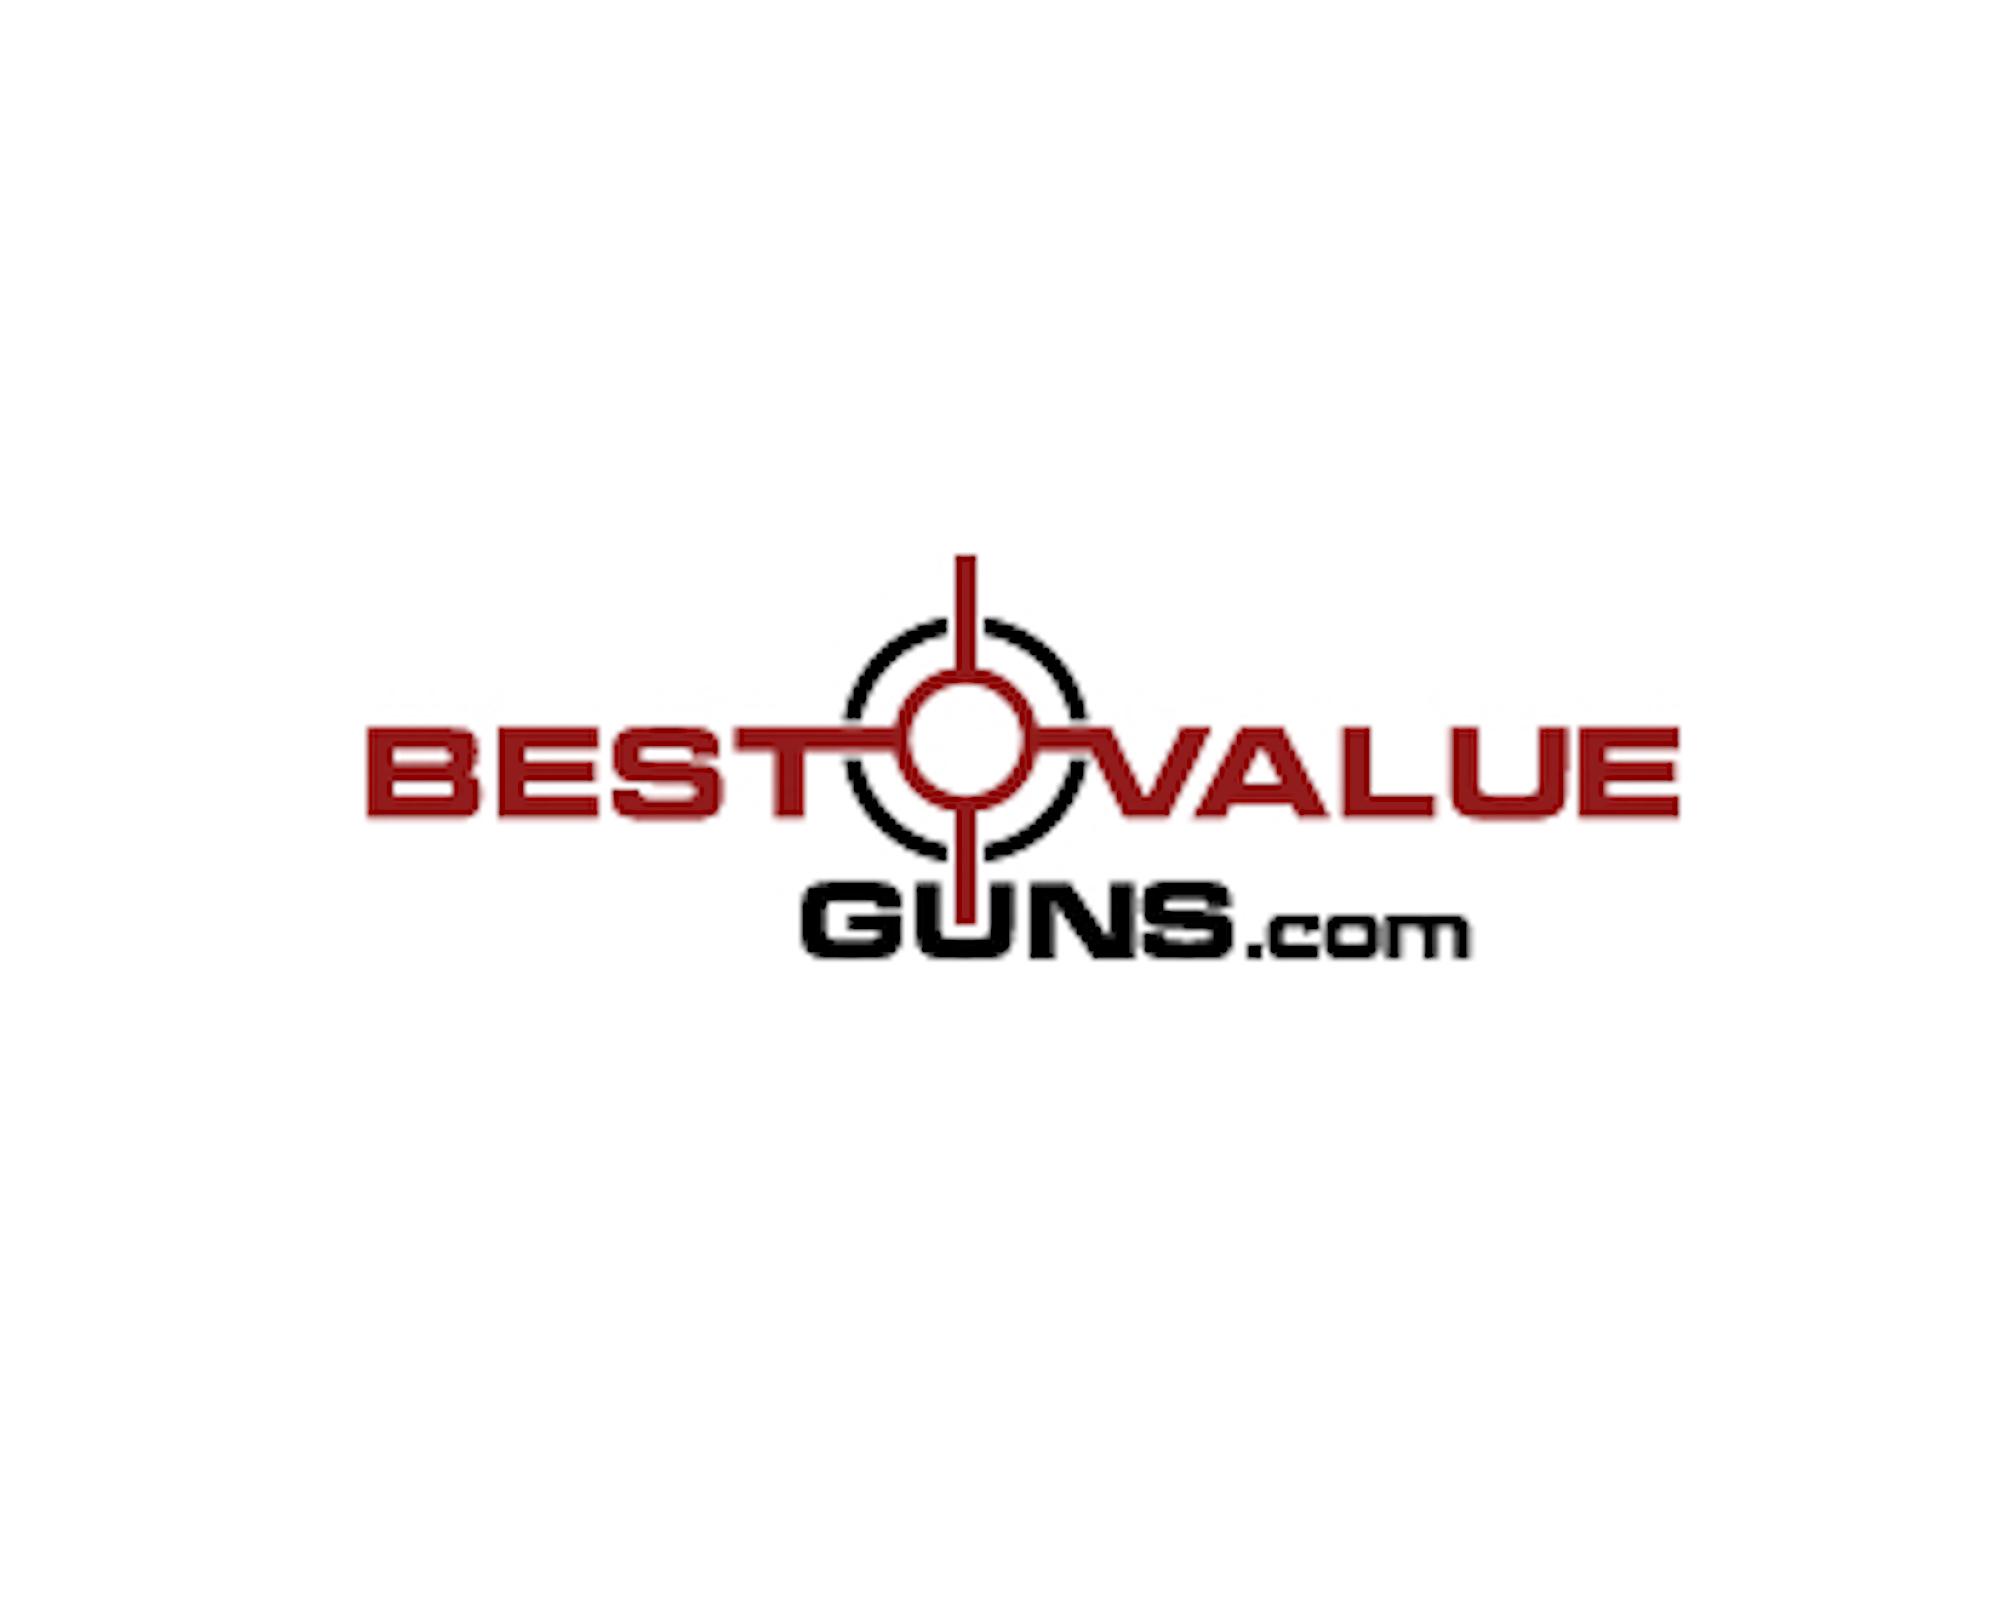 Smith & Wesson, M&P15-22, Semi-Automatic, AR, 22LR, 16 5